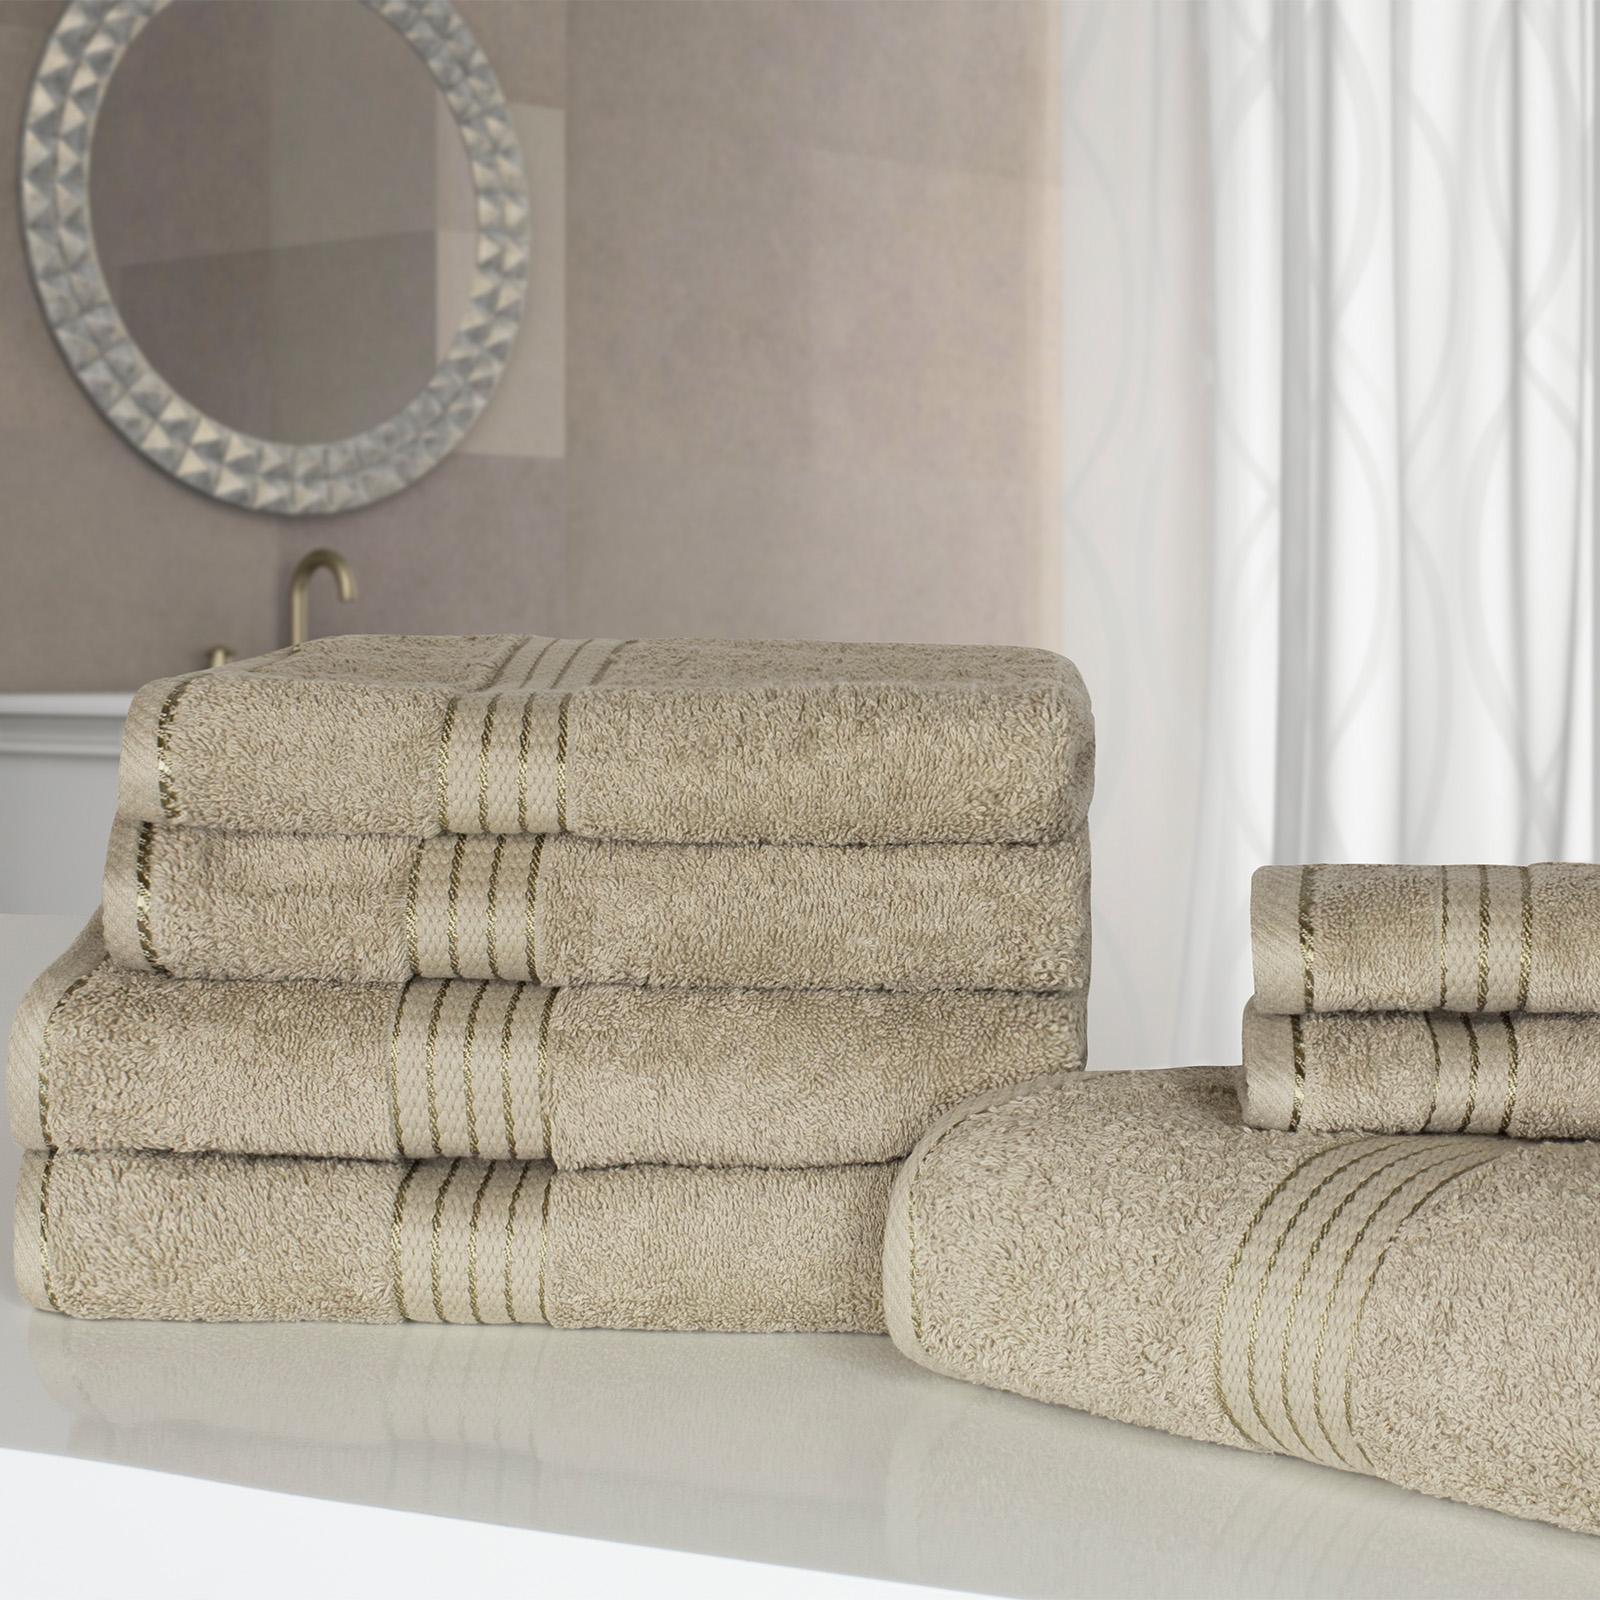 Bathroom Towels Luxury: 100% Egyptian Cotton Luxury Soft Face Hand Bath Towel Bale